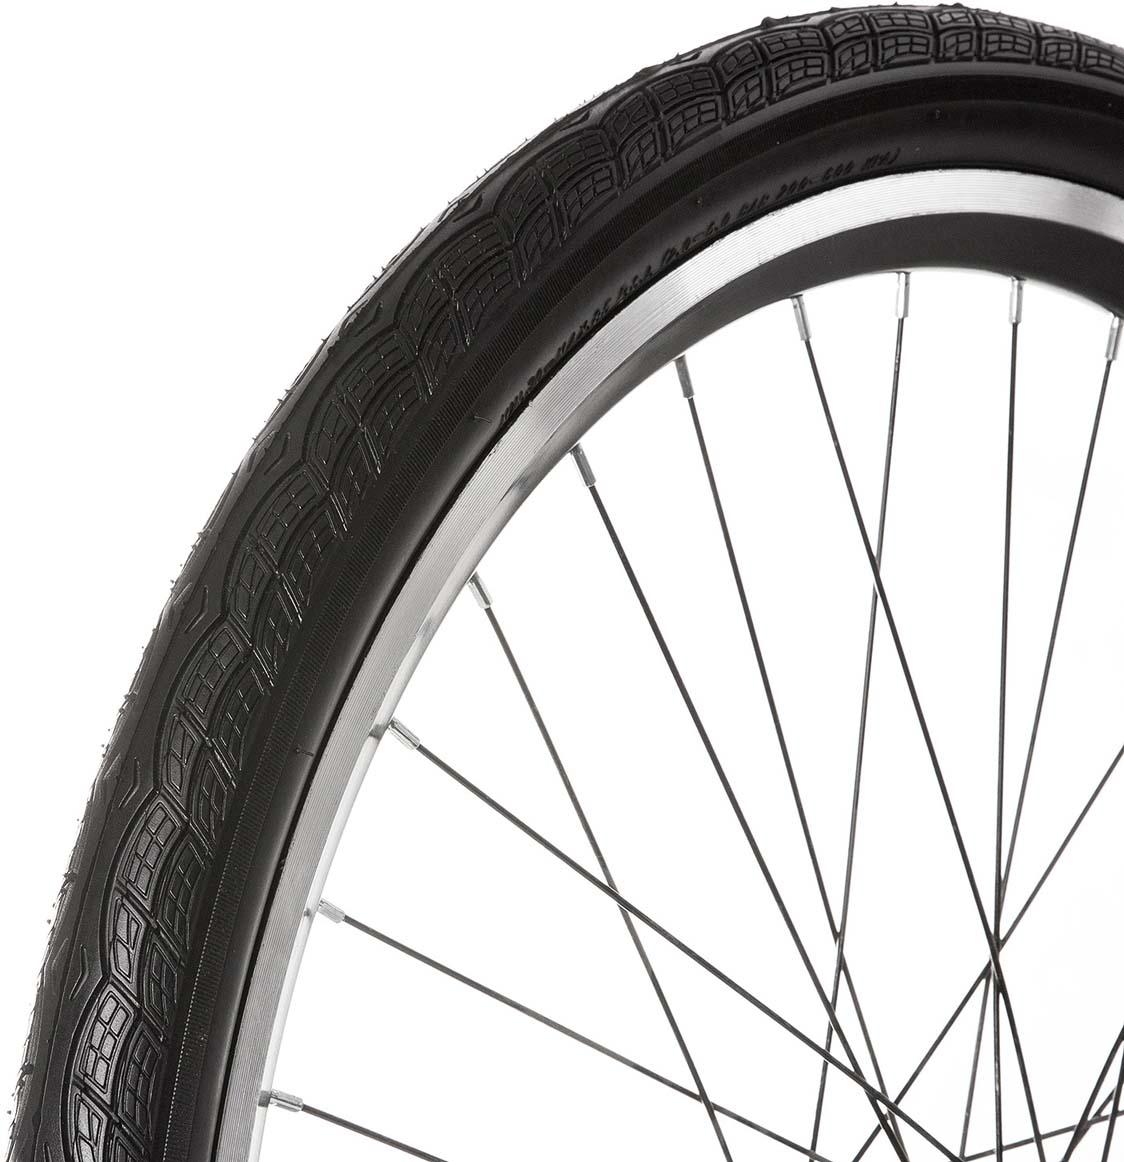 Покрышка слик Kenda Kommuter 26х2.00 5-520608 (50-559) K1045 kenda high quality mtb folding bicycle tire mountain bike tyre tires 26 27 5 29x1 95 2 1 2 35 bike parts accessories